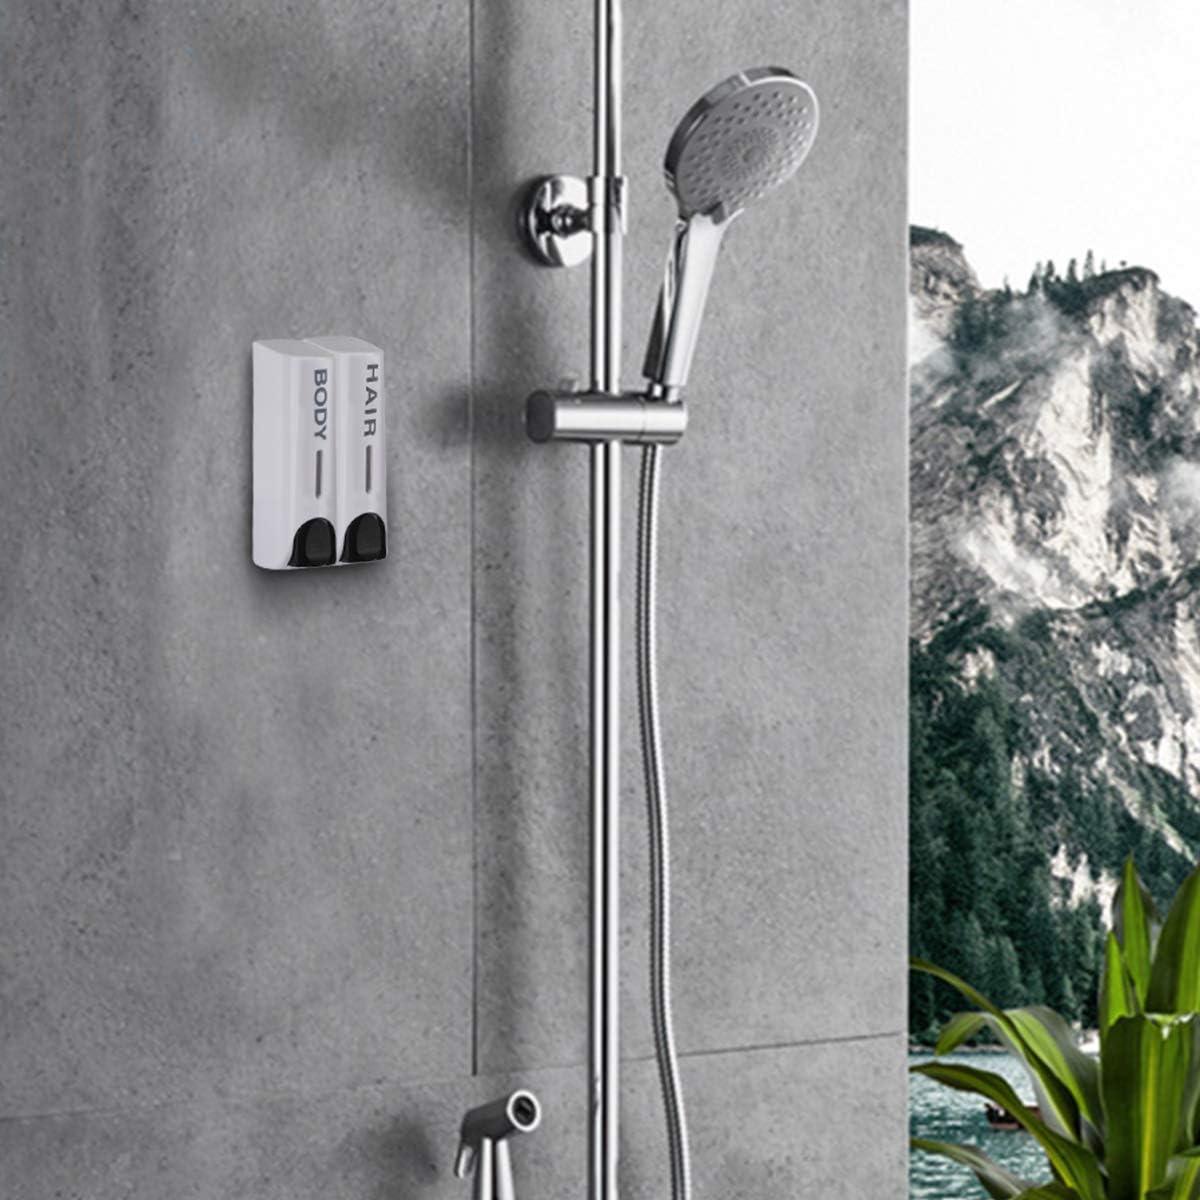 AUMIO Chamber Soap Dispenser Trio Shower Gel Shampoo Conditioner ABS Wall Mount Silver